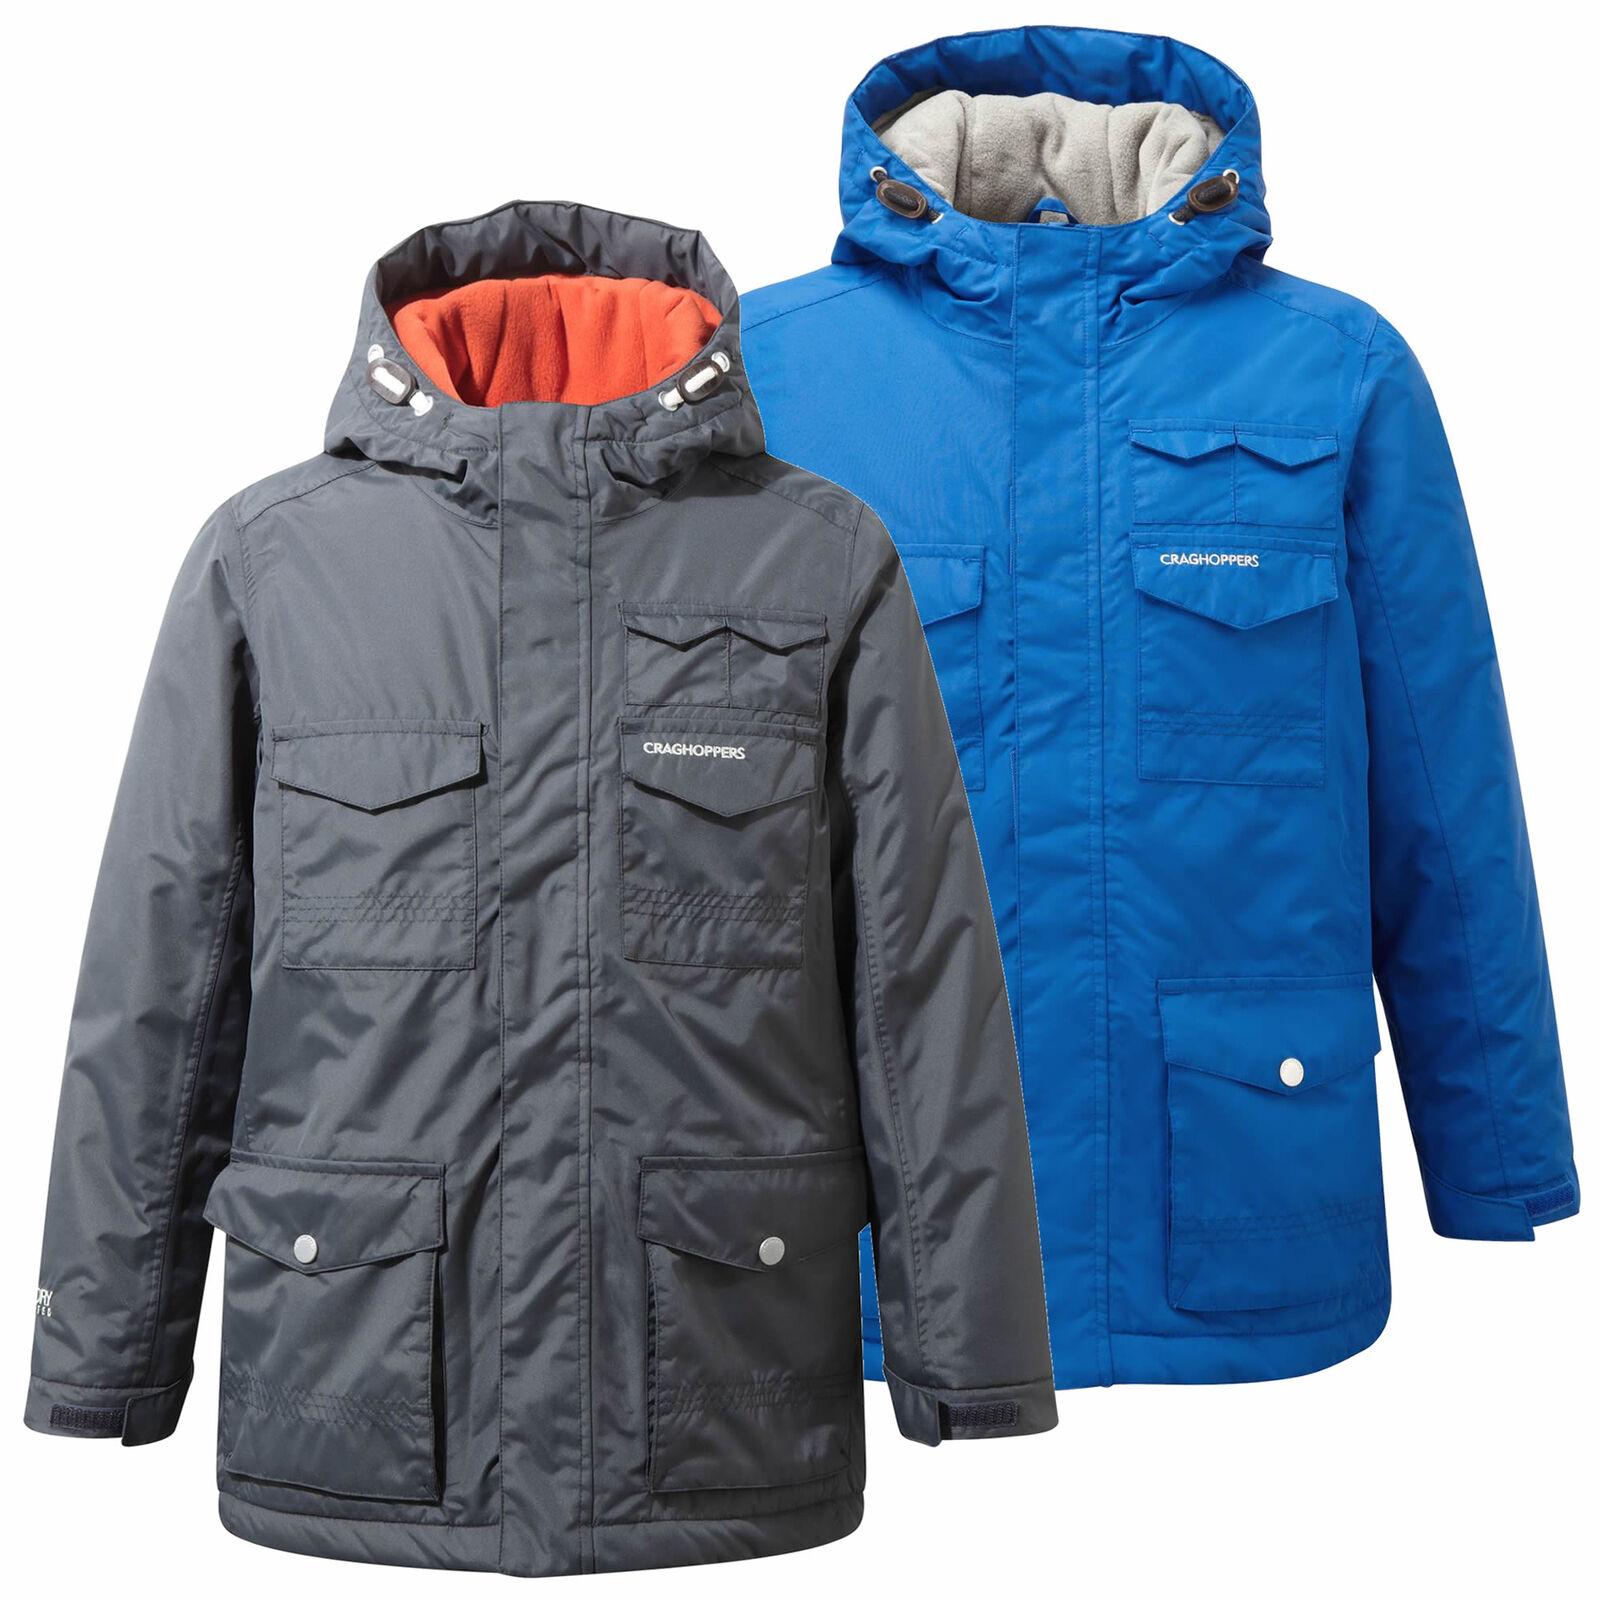 CRAGHOPPERS Kids CHILDRENS LIGHTWEIGHT WATERPROOF COAT Jacket Blue **RRP £40**